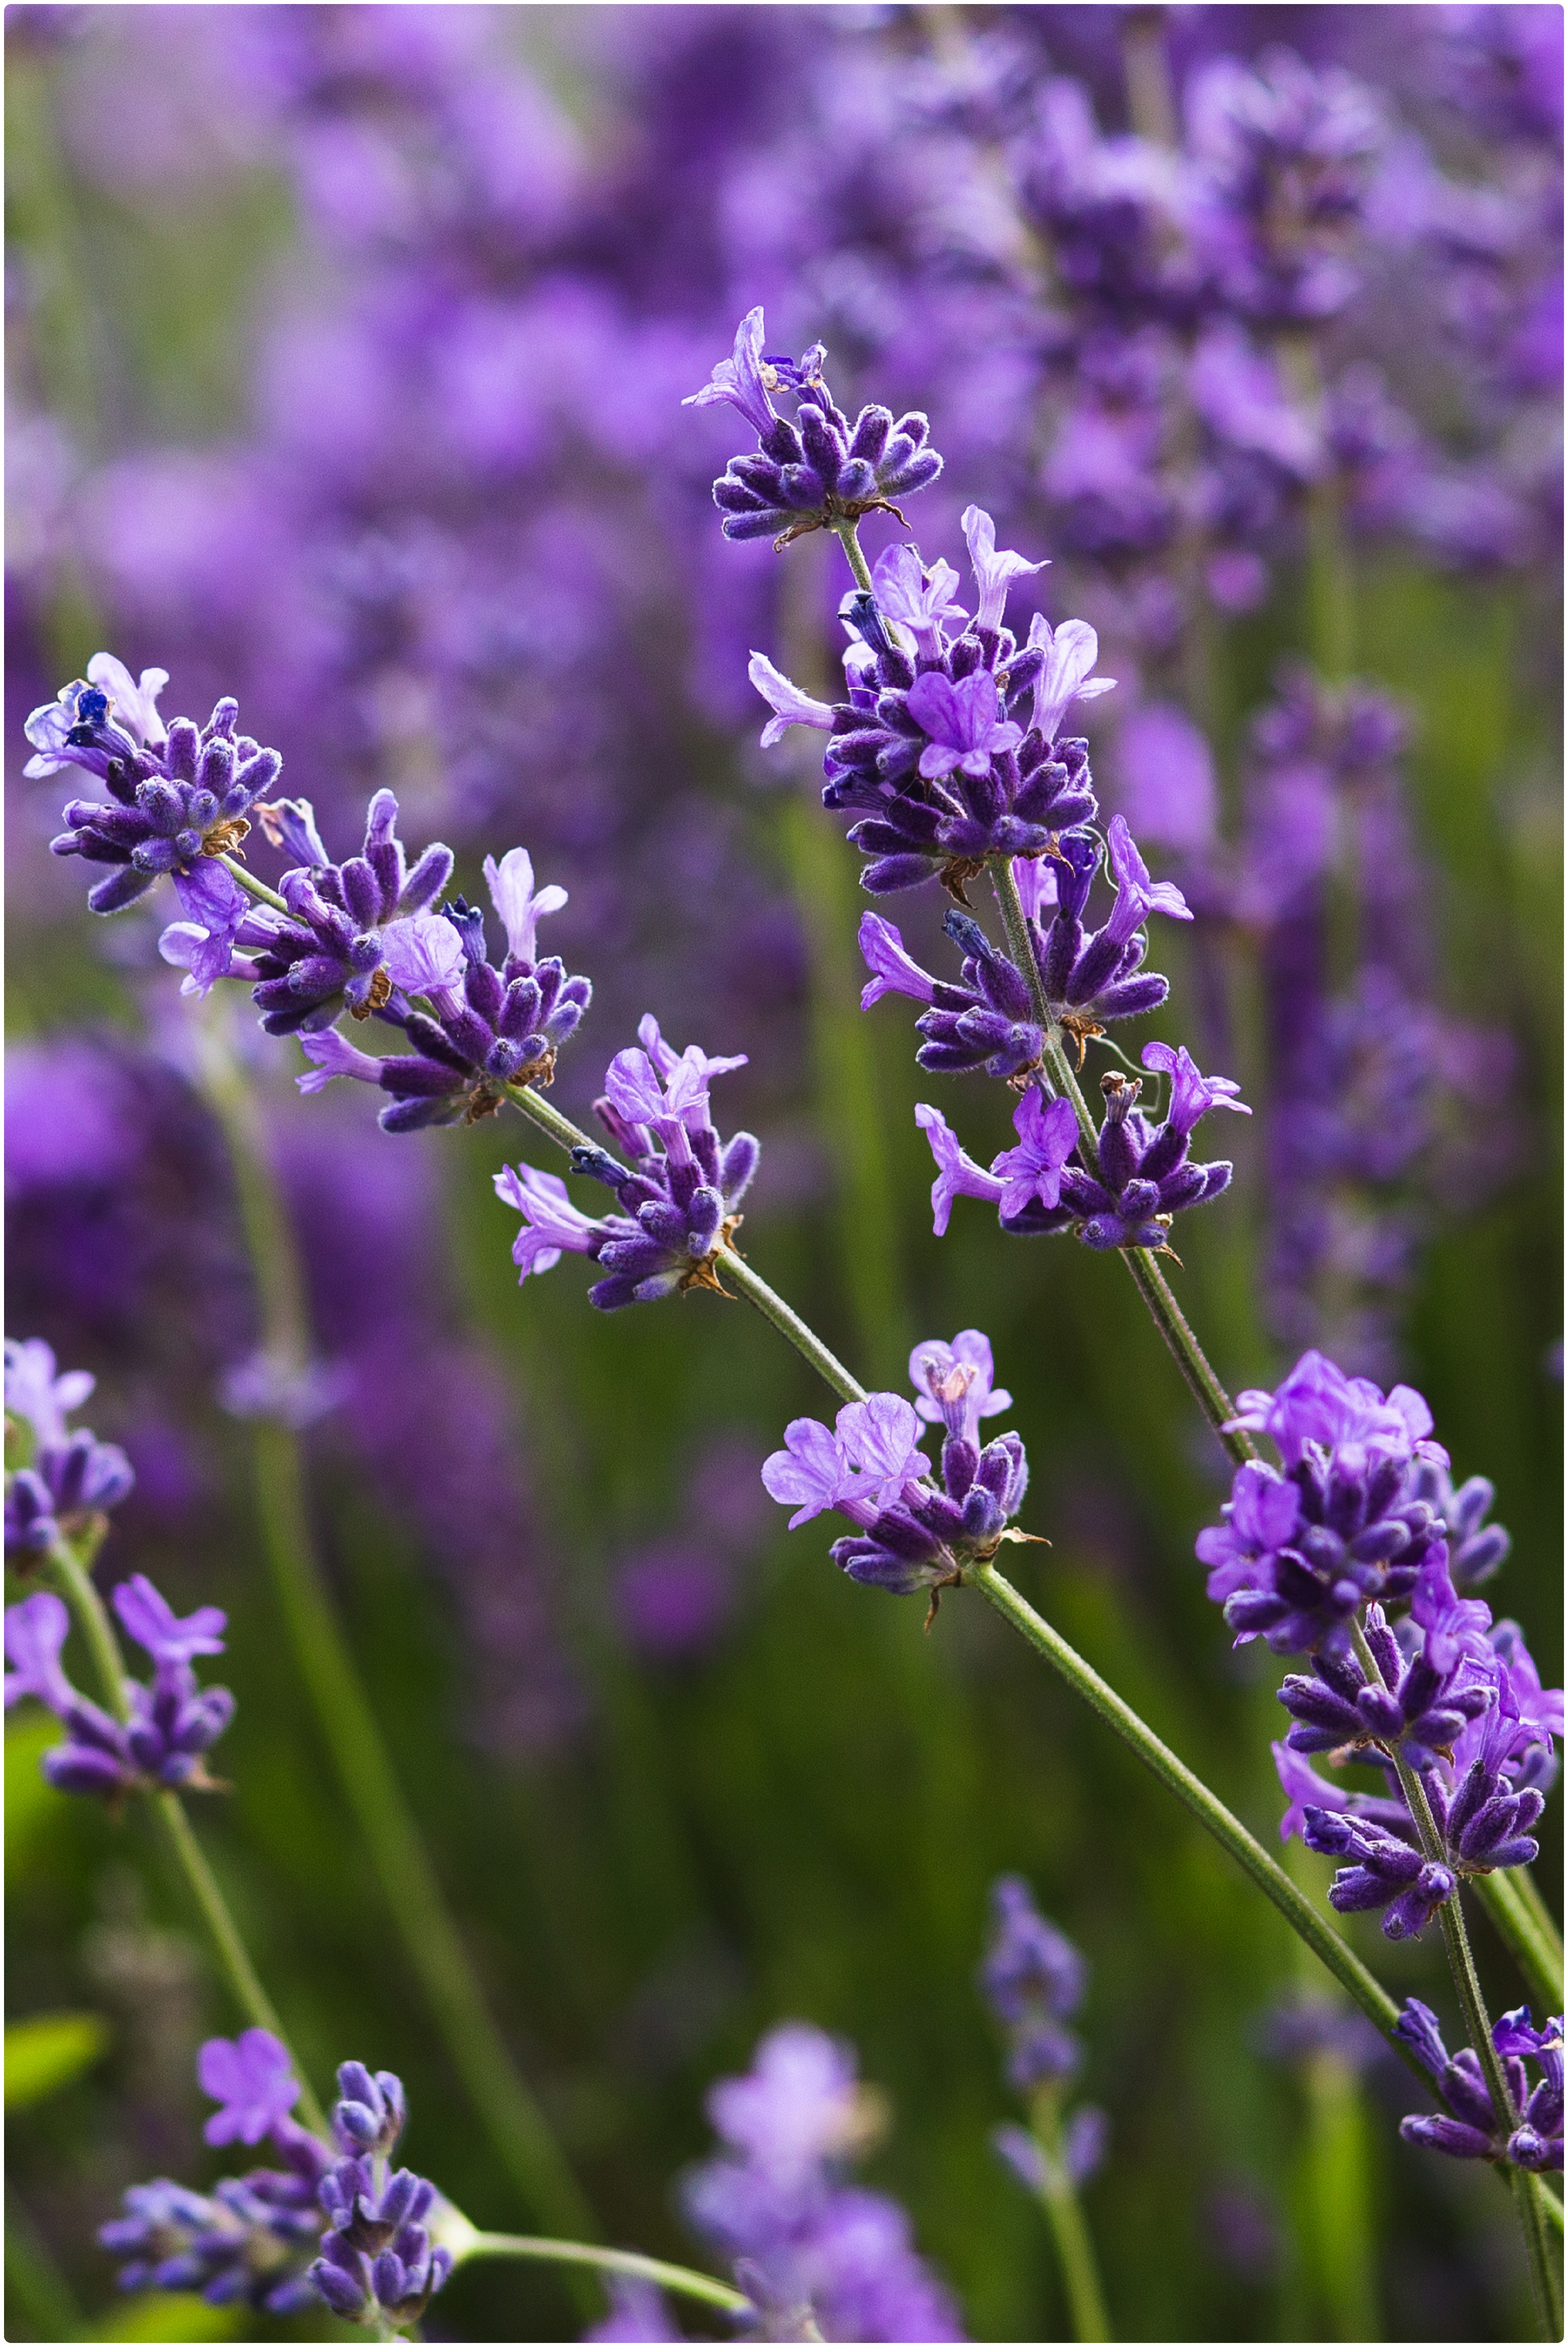 Lavender family photo shoot